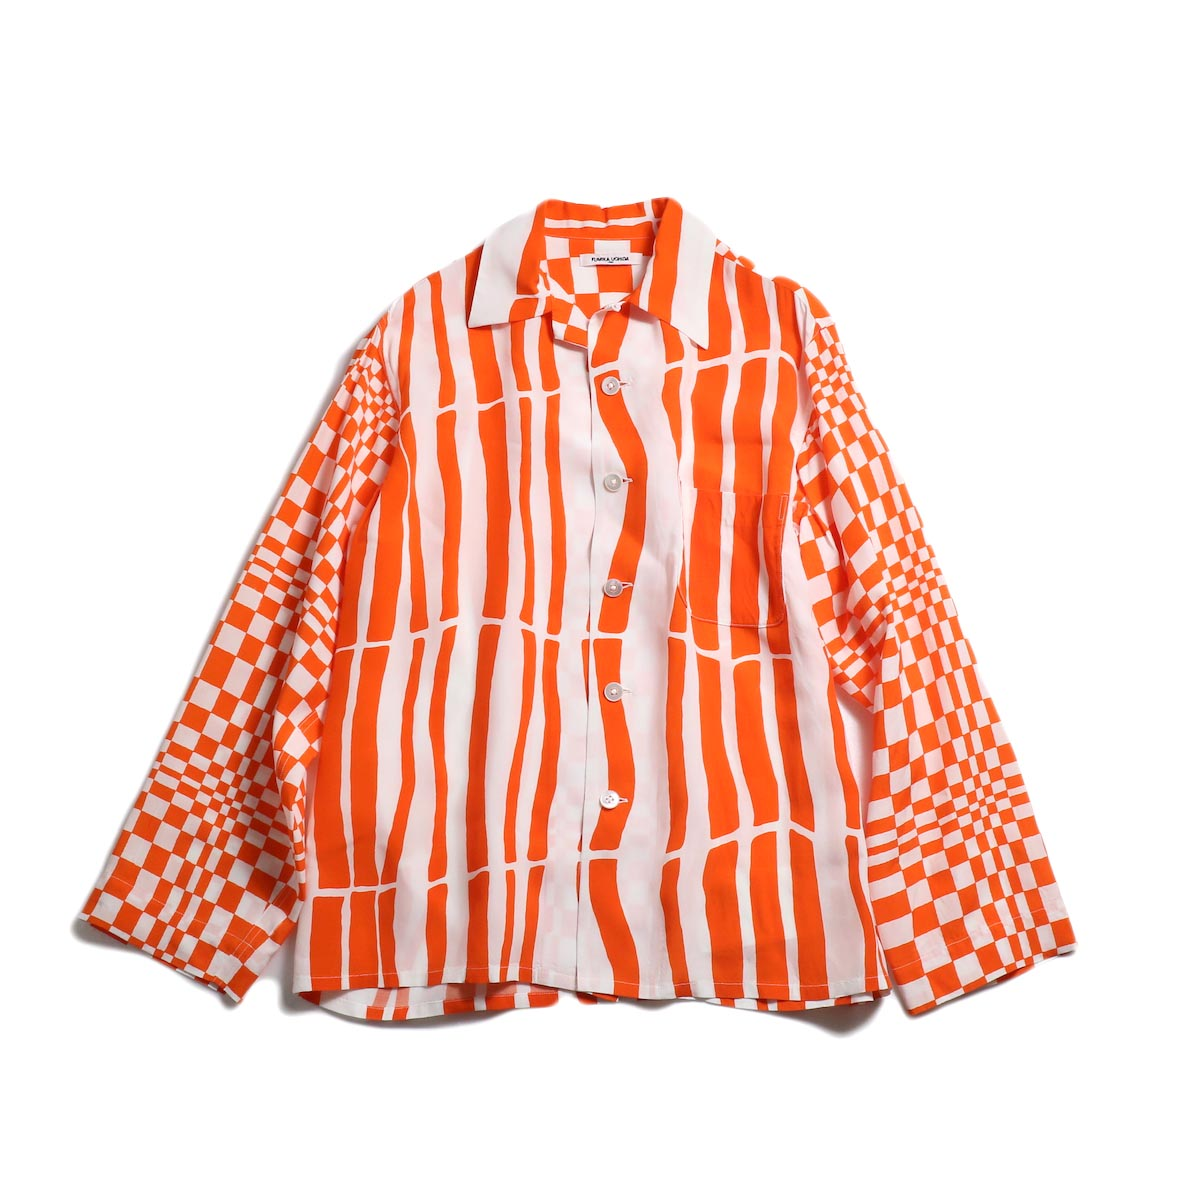 FUMIKA UCHIDA / Rayon_Crazy Open Collar Shirt -White/Orange